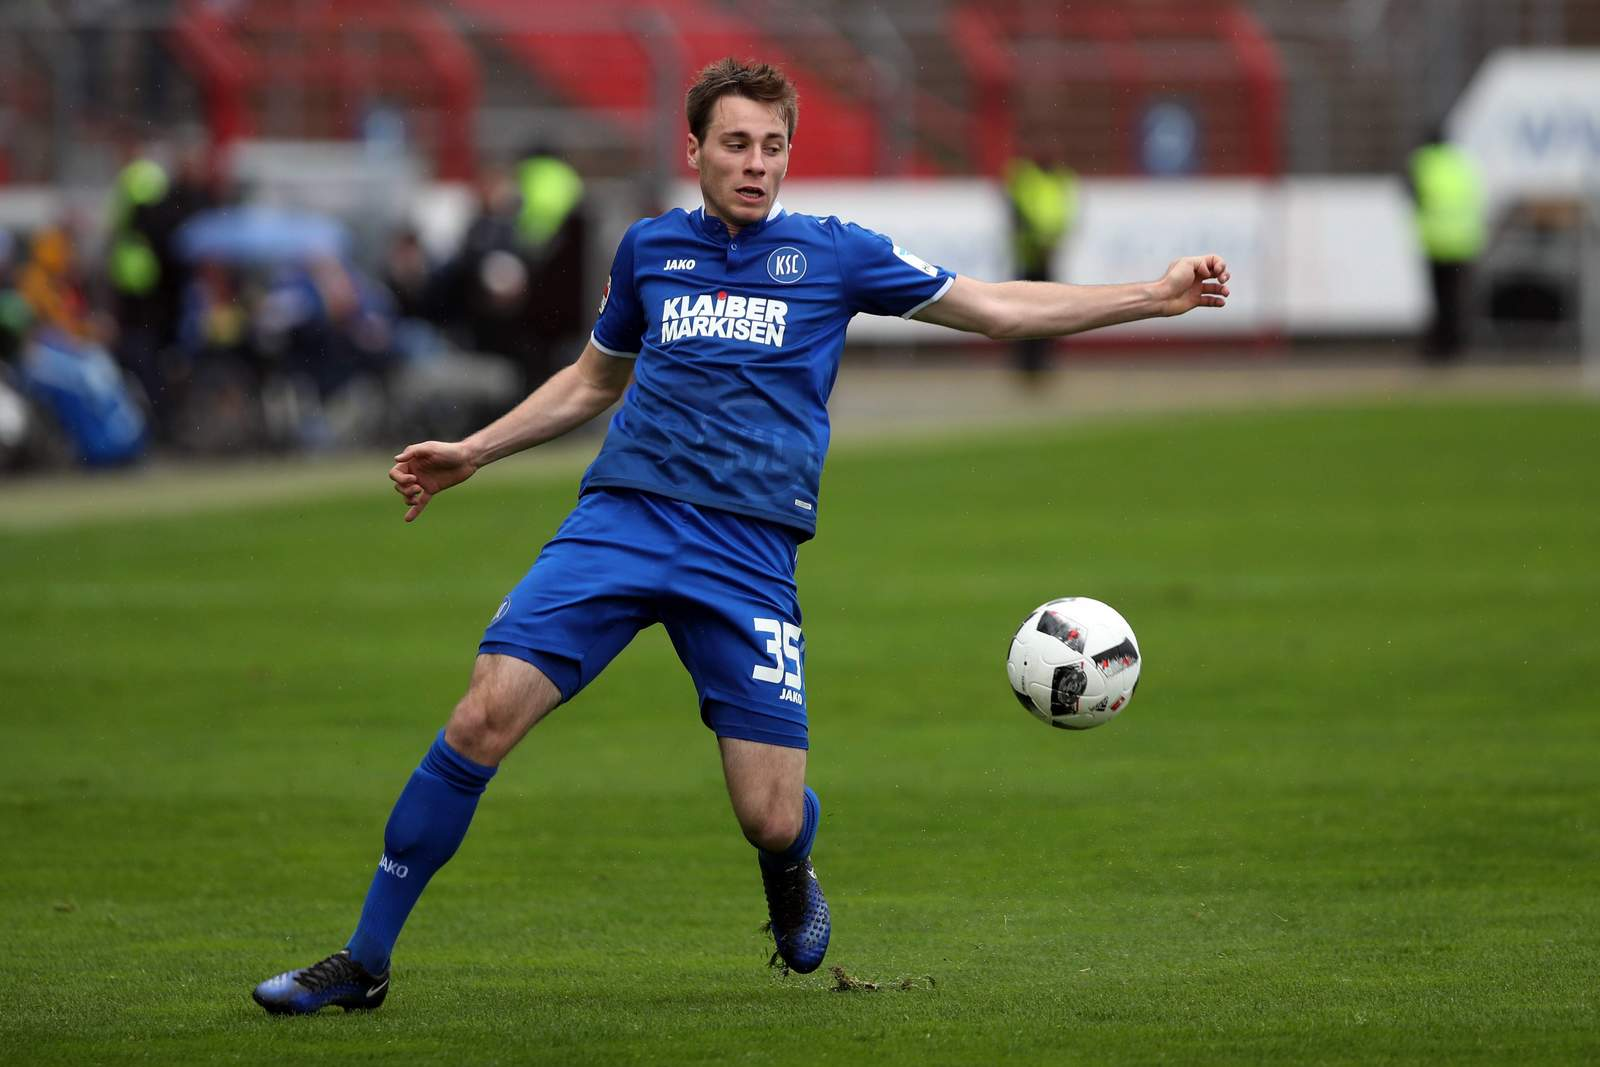 Matthias Bader vom KSC